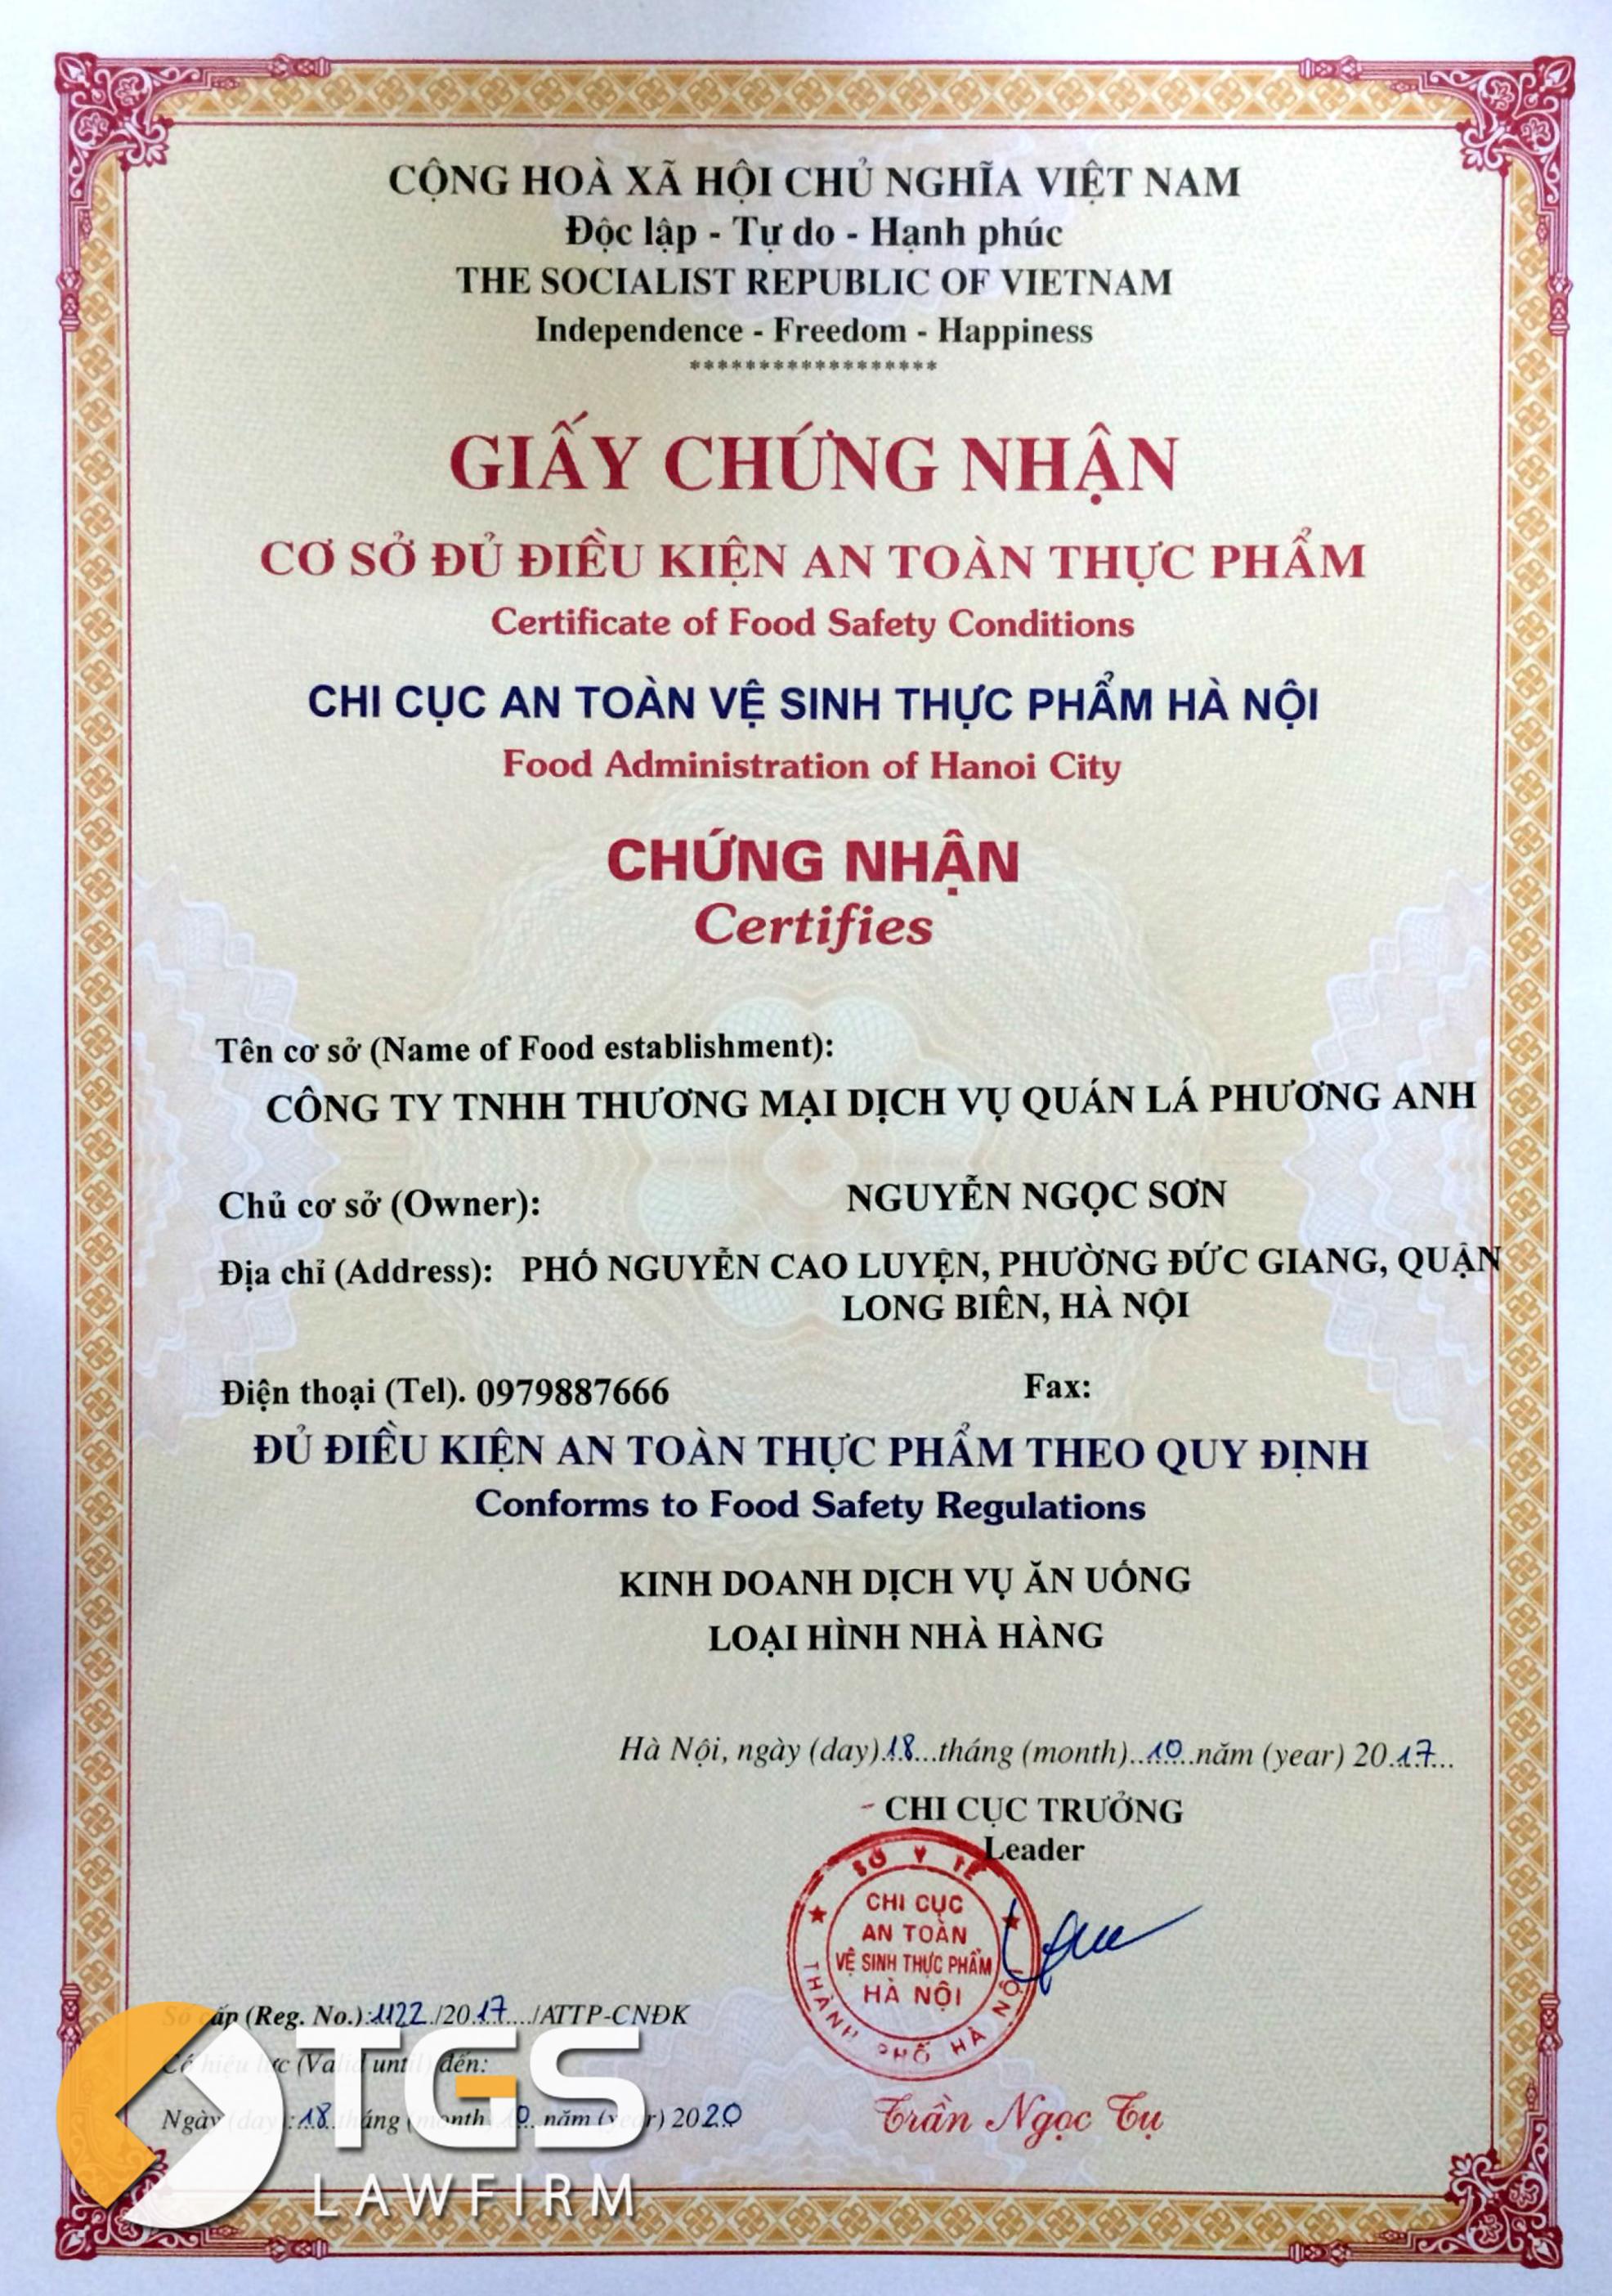 newvisionlaw-xin-cap-thanh-cong-giay-chung-nhan-co-so-du-dieu-kien-an-toan-thuc-pham-cho-nha-hang-quan-la-phuong-anh